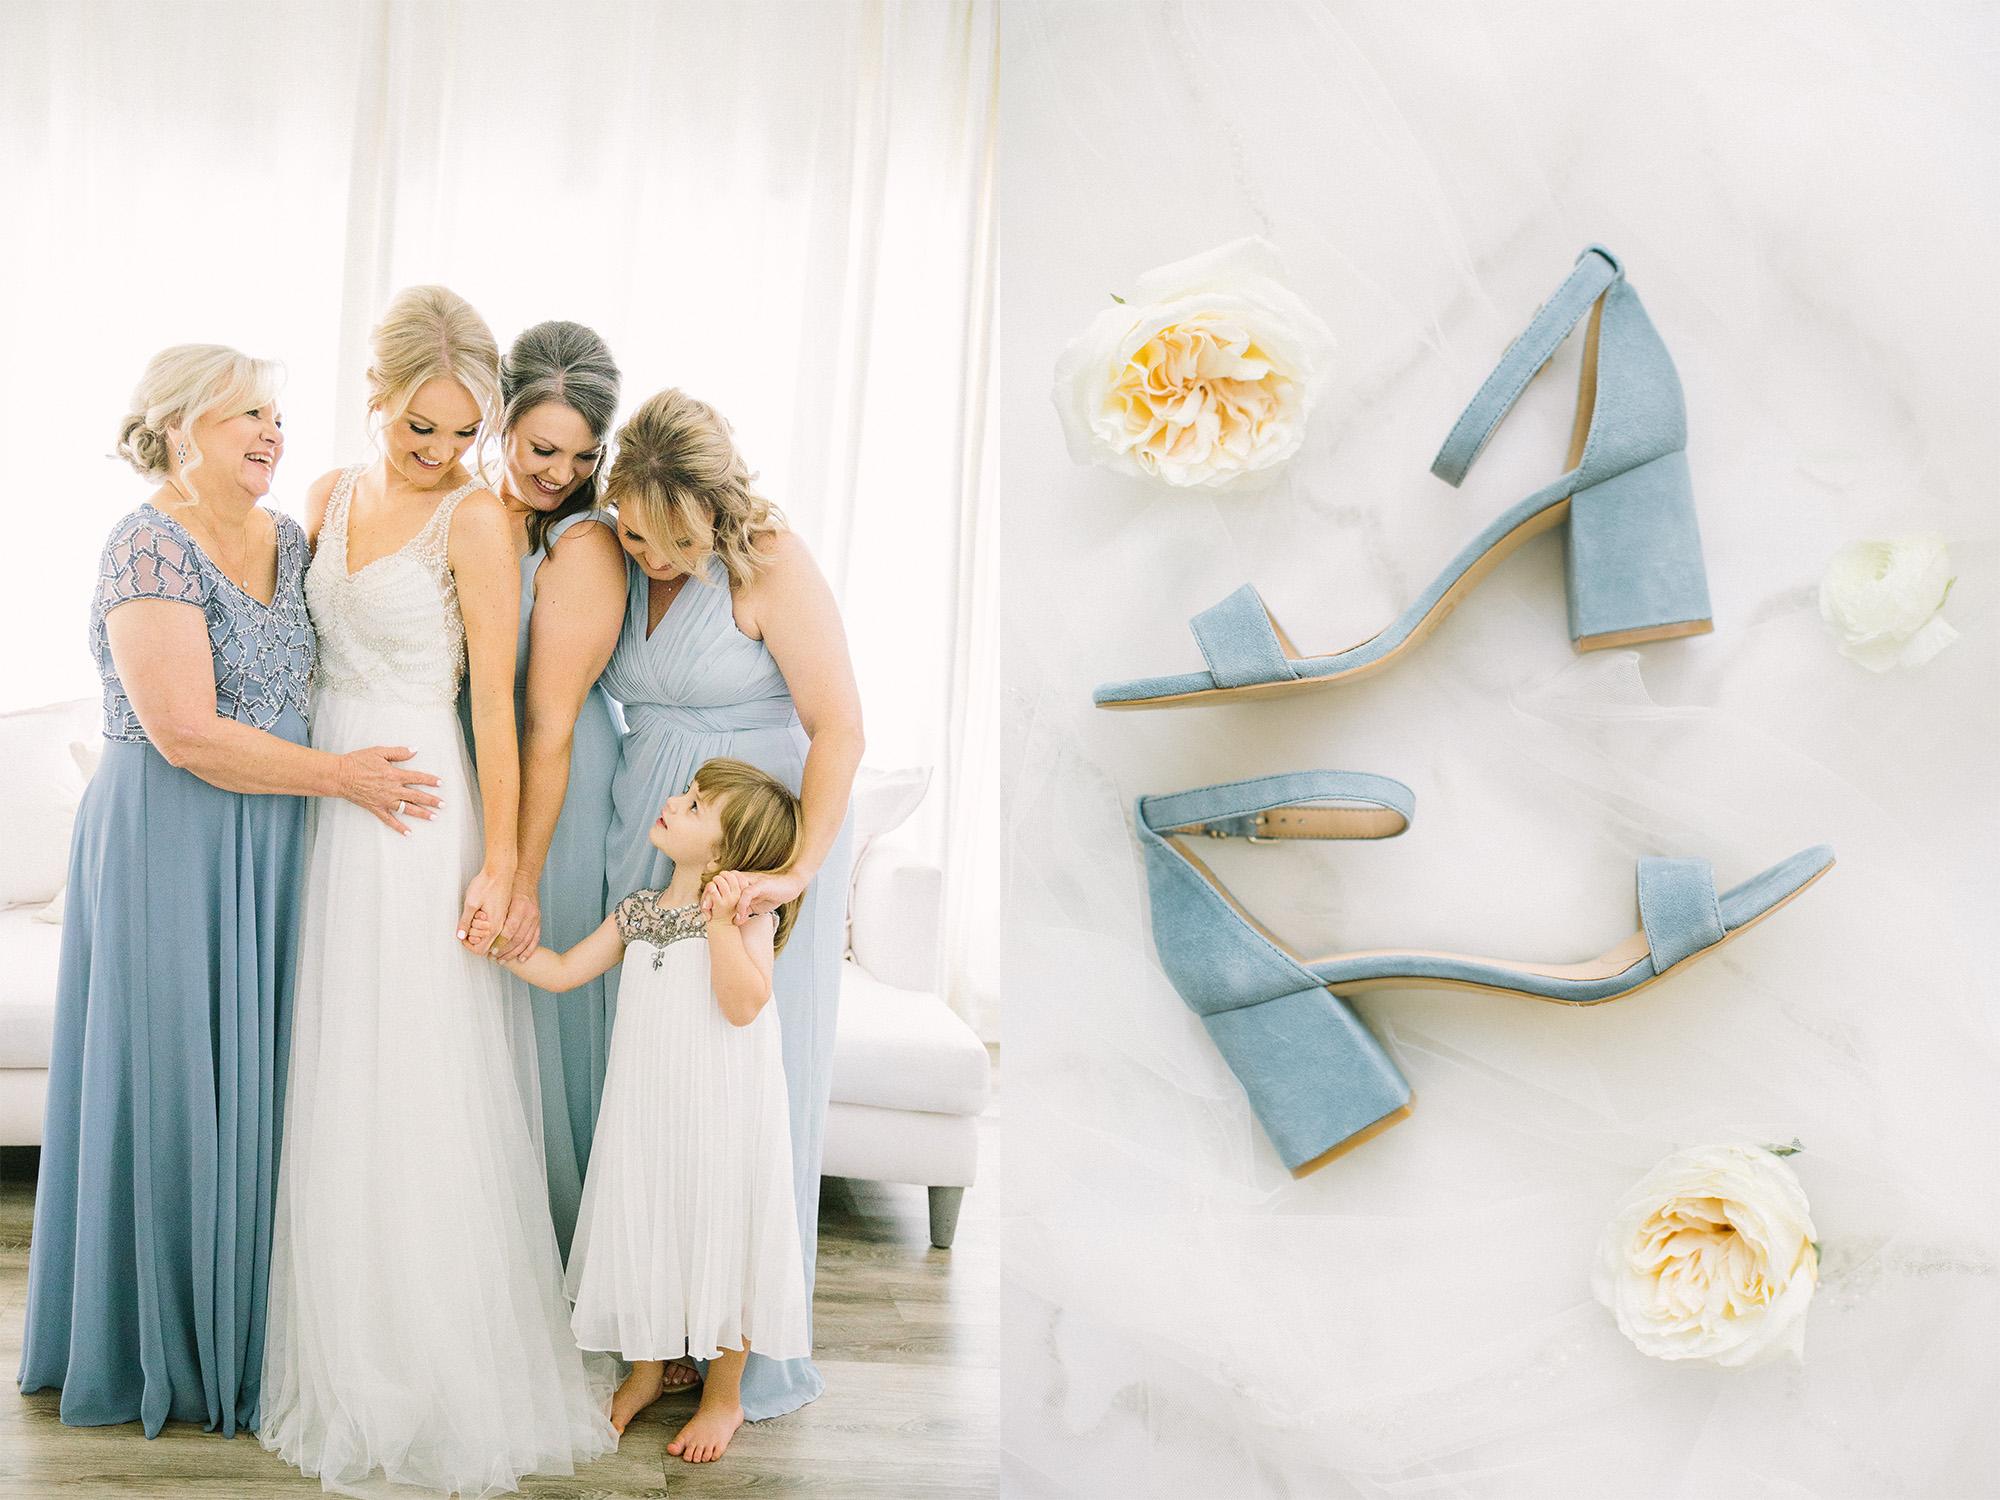 Ellen-Ashton-Photography-Dallas-Wedding-Photographers-Lean-On-Me-Events-The-Farmhouse-Events-Weddings-Montgomery-Texas-10.jpg